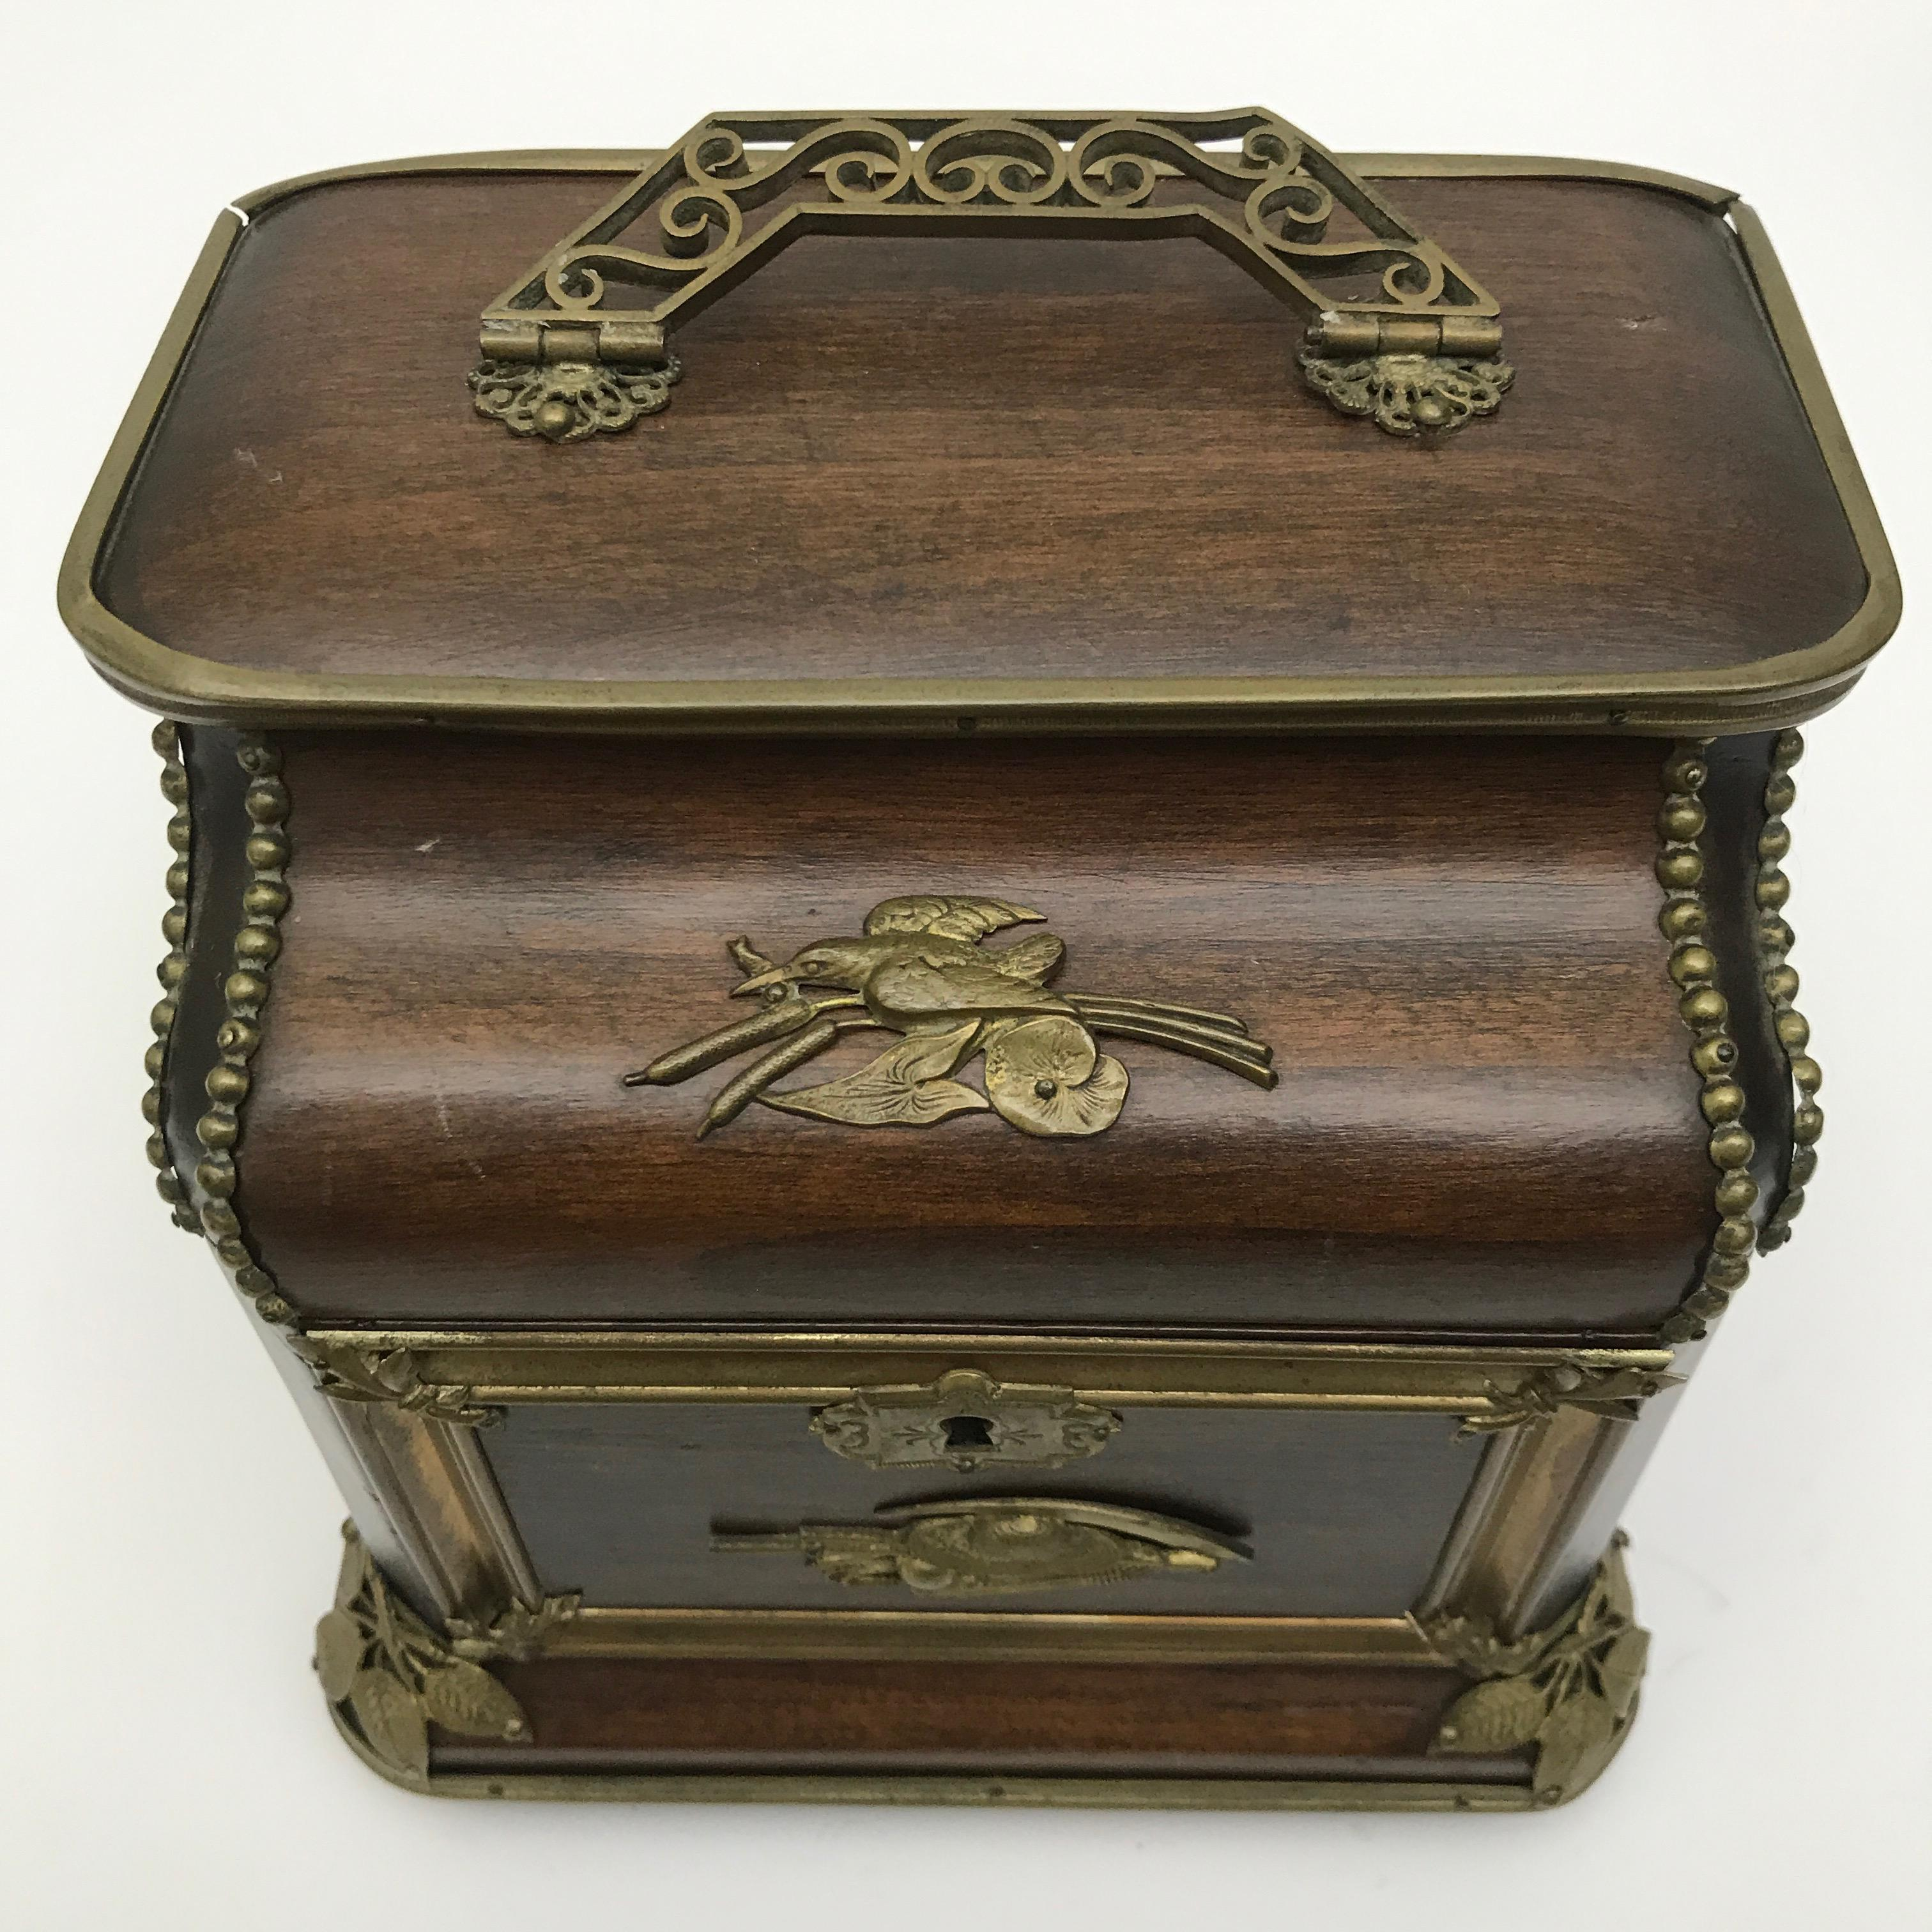 Antique French Jewelry Box Chairish